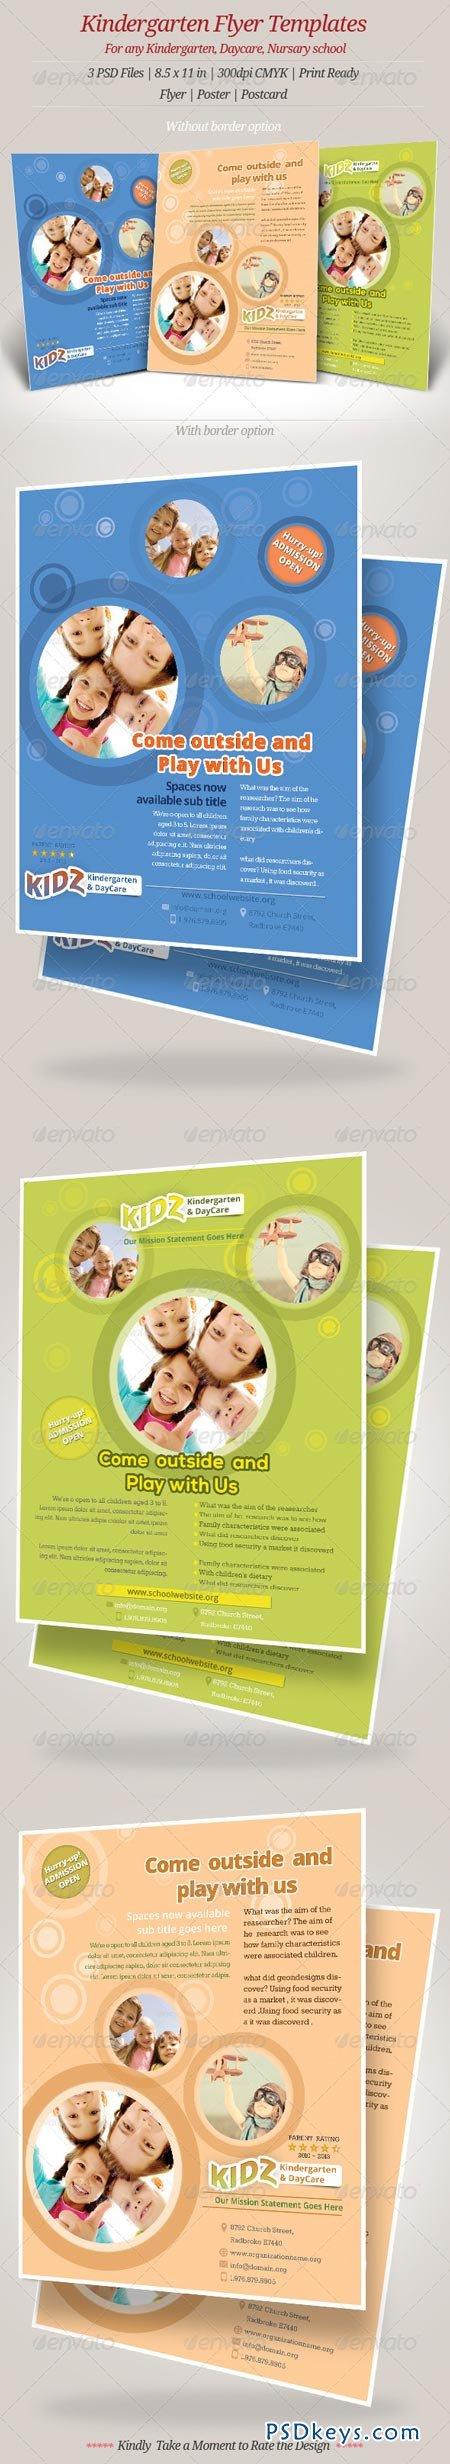 Kindergarten Daycare Flyer Templates 6972717